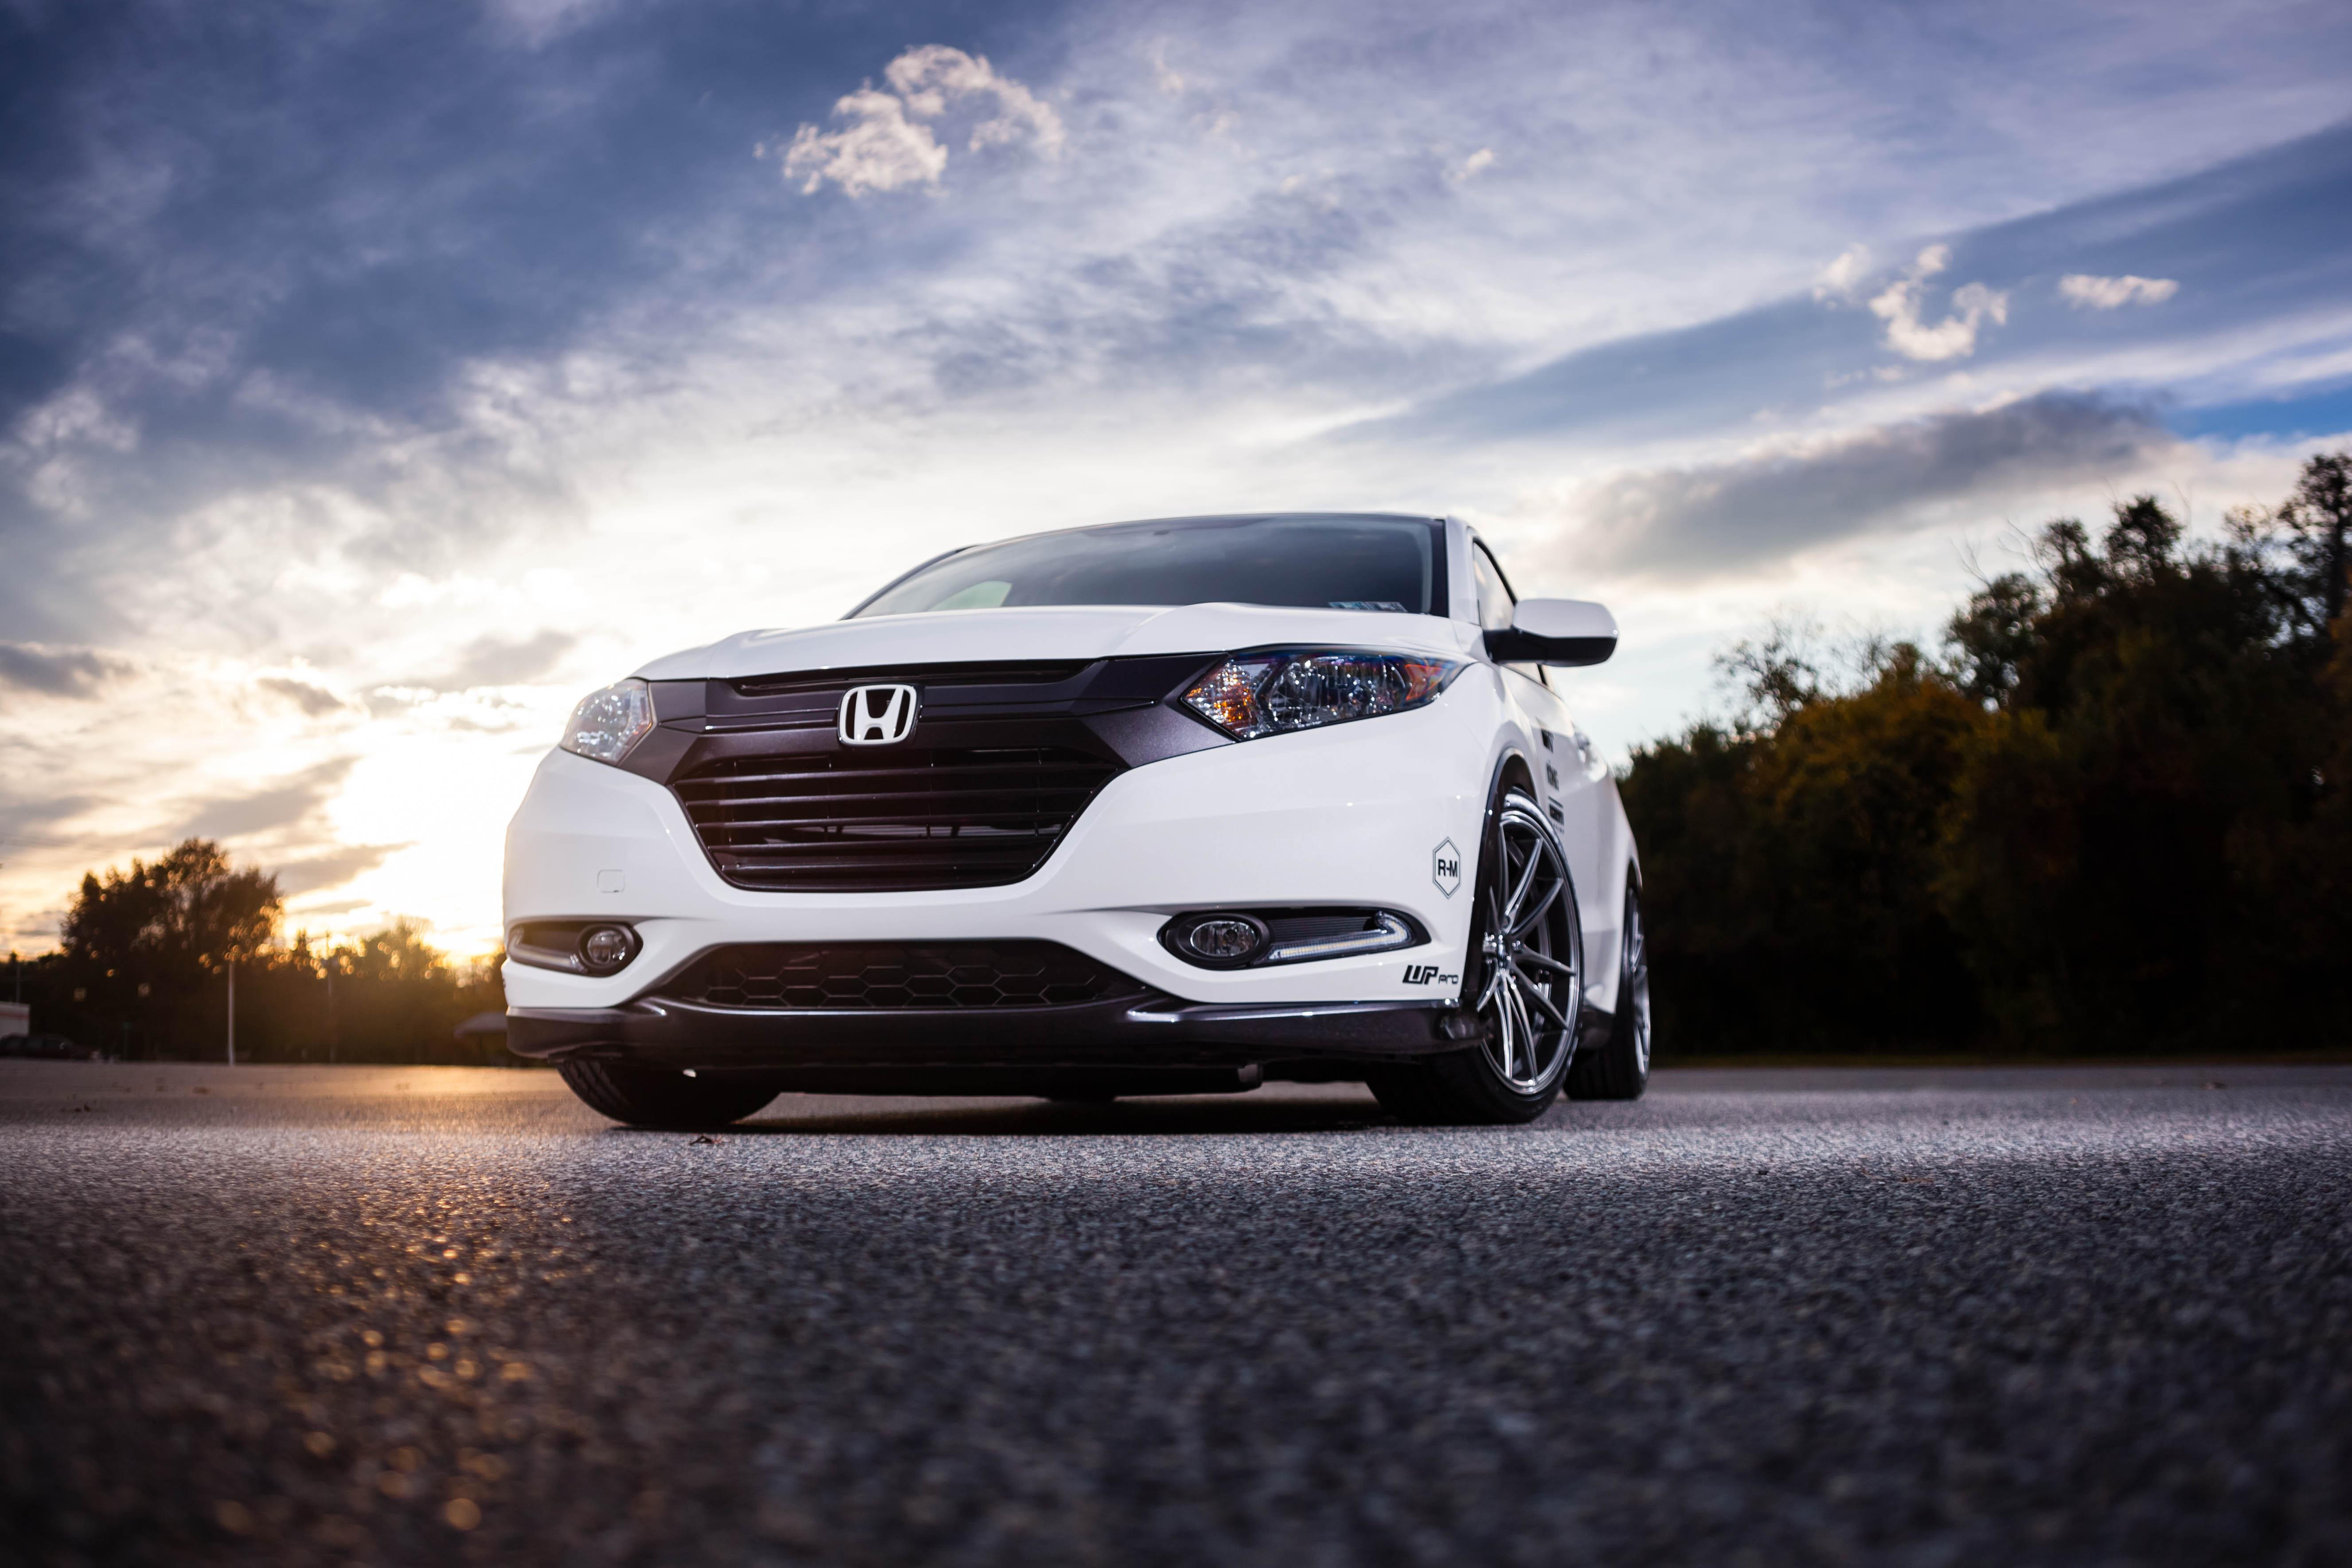 ... 2017 Honda Civic, facelifted CR-Z, Pilot and Pioneer 1000 at SEMA